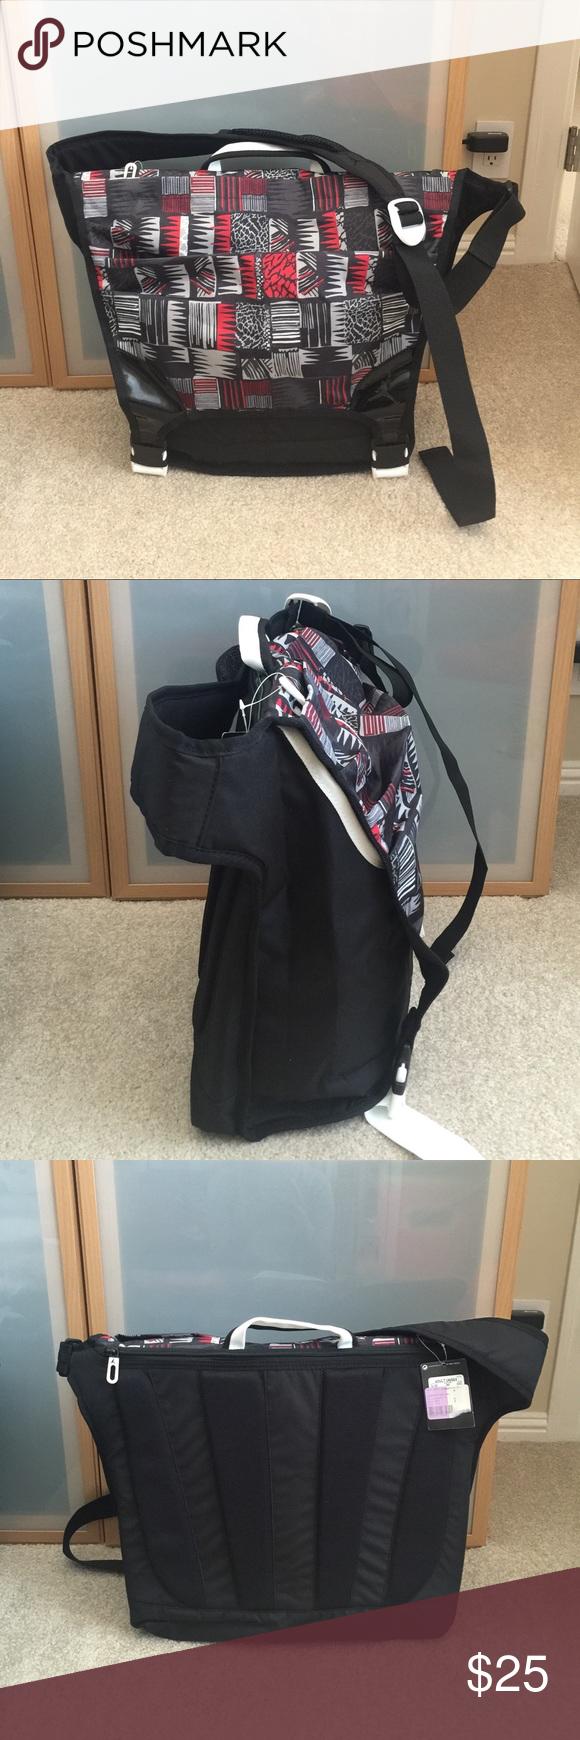 95e6706ab47092 NWT Jordan messenger bag